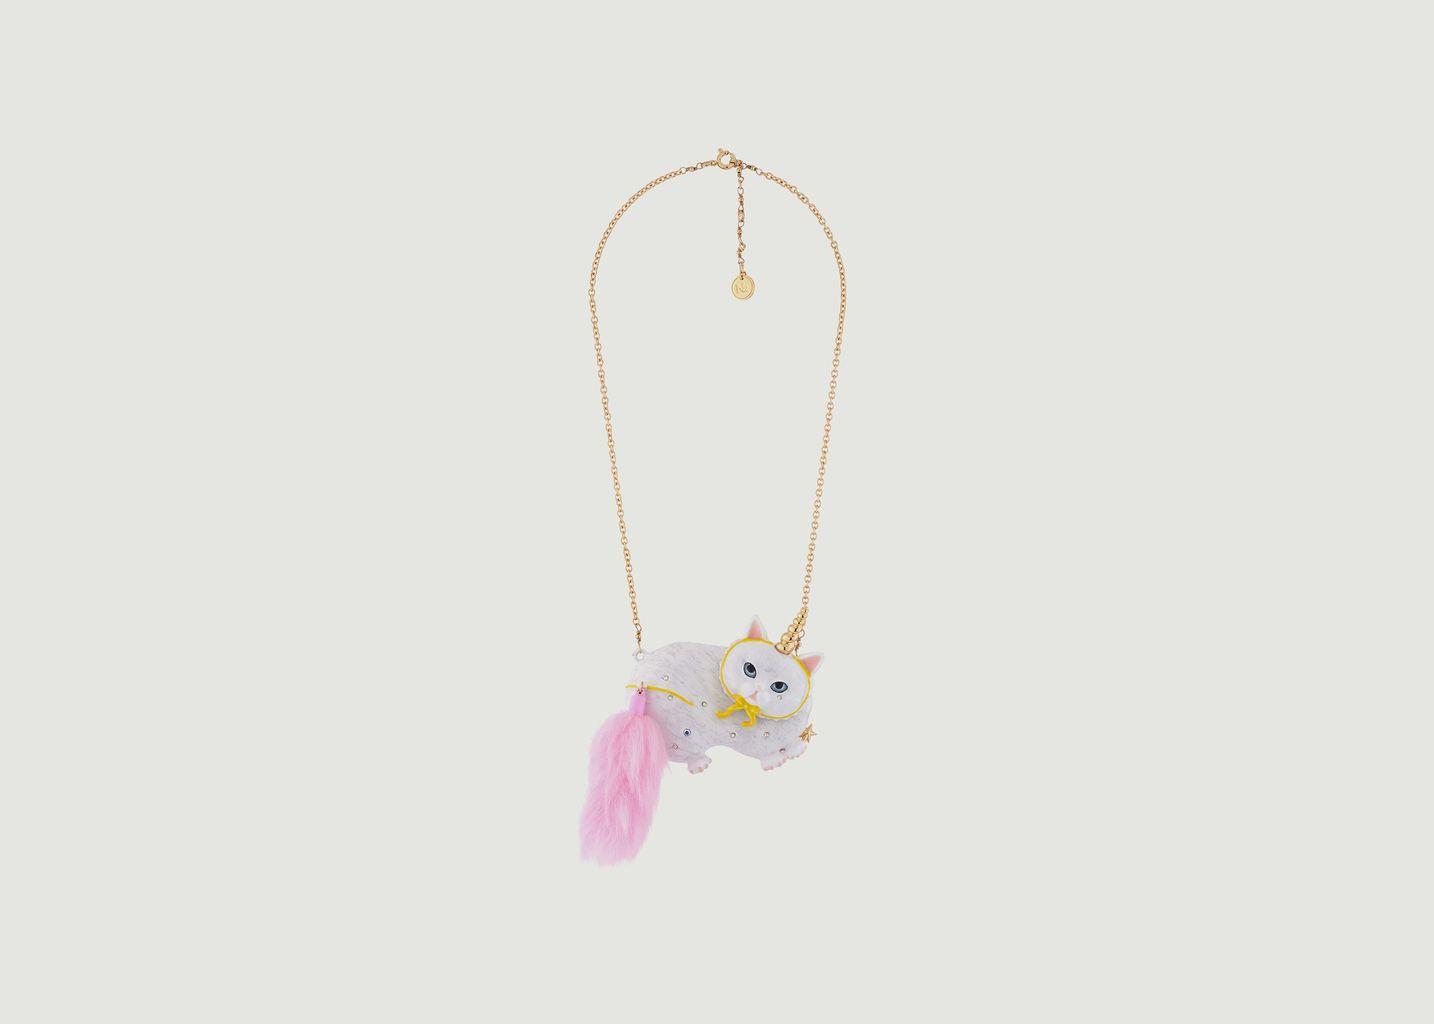 Persian Unicorn Necklace - N2